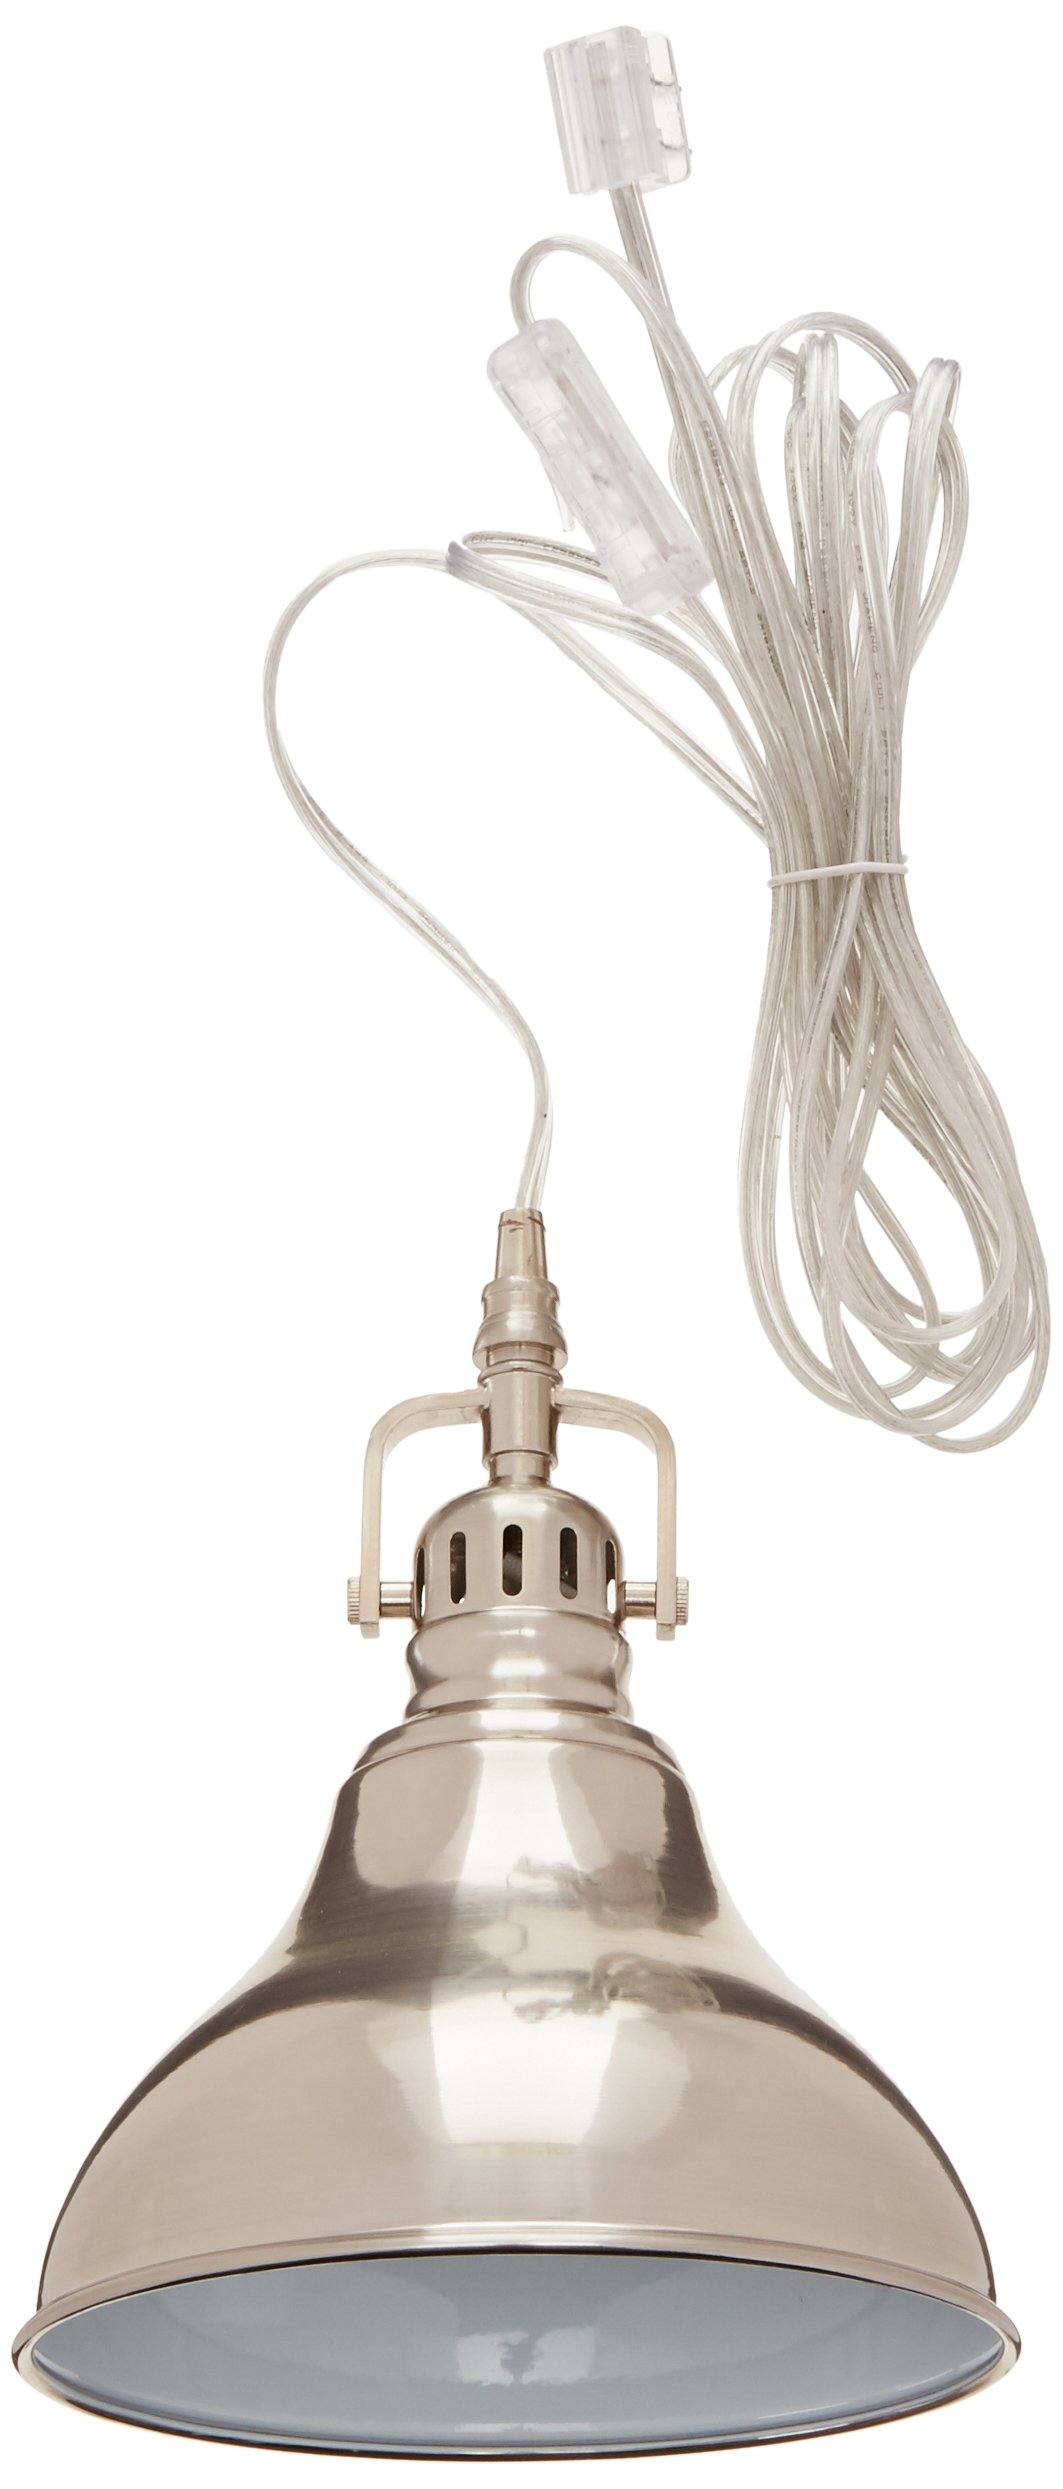 GLOBE ELECTRIC 65440 1-Light Steel Plug-in Pendant